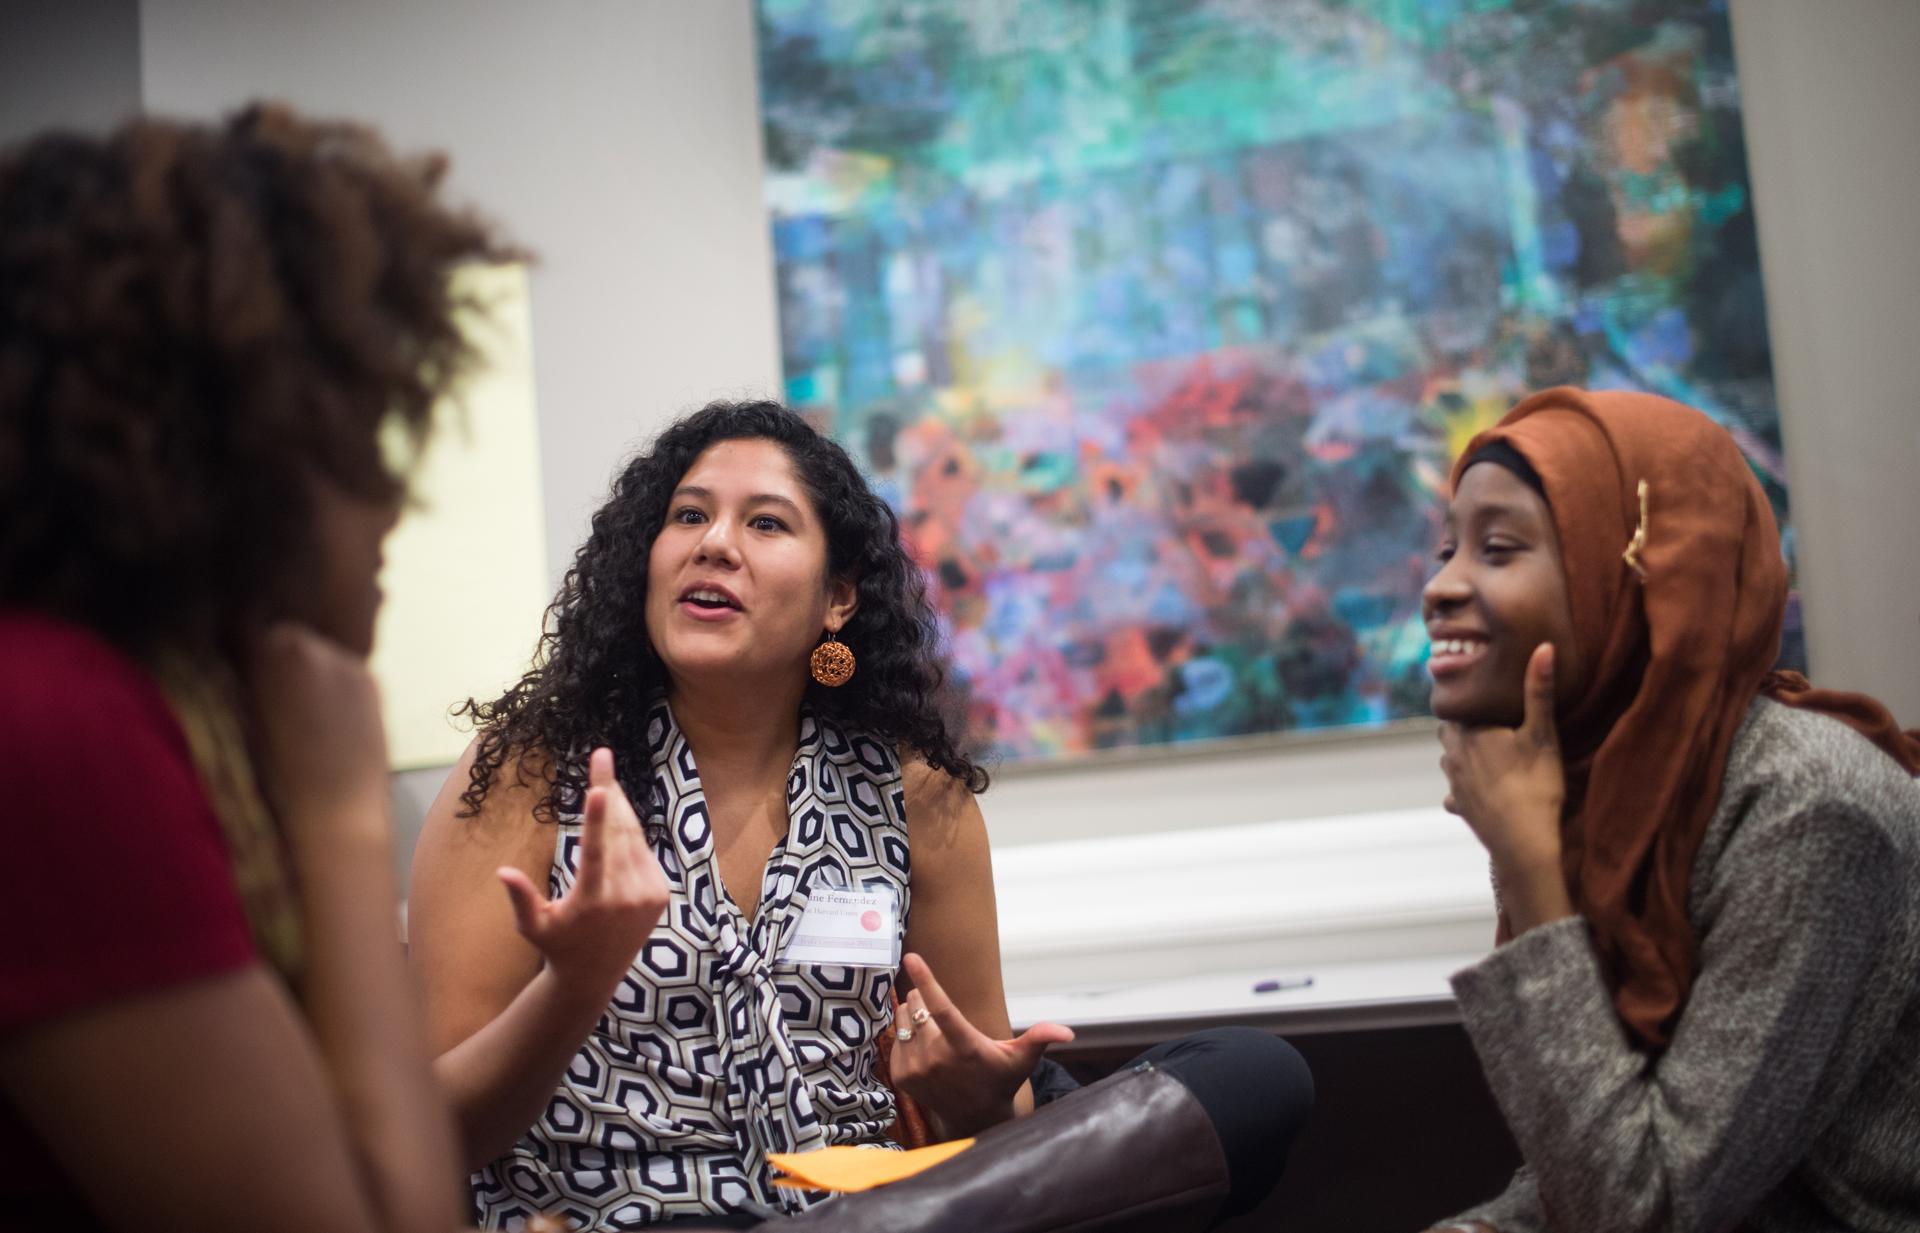 Photo by: Gretchen Ertl/Boston Globe (Esther Maddox/Princeton, Jasmine Fernandez/Harvard, and Kujegi Camara/Princeton)